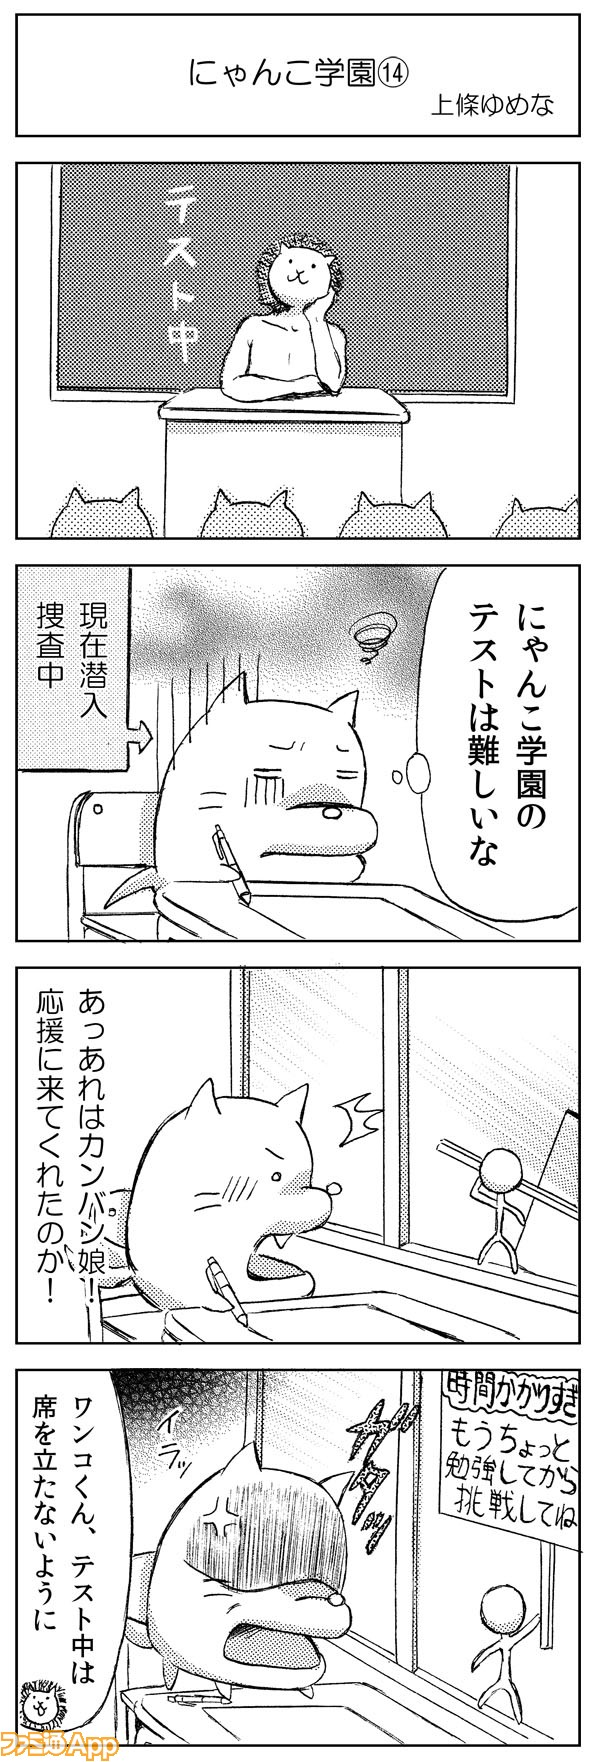 03kami_074